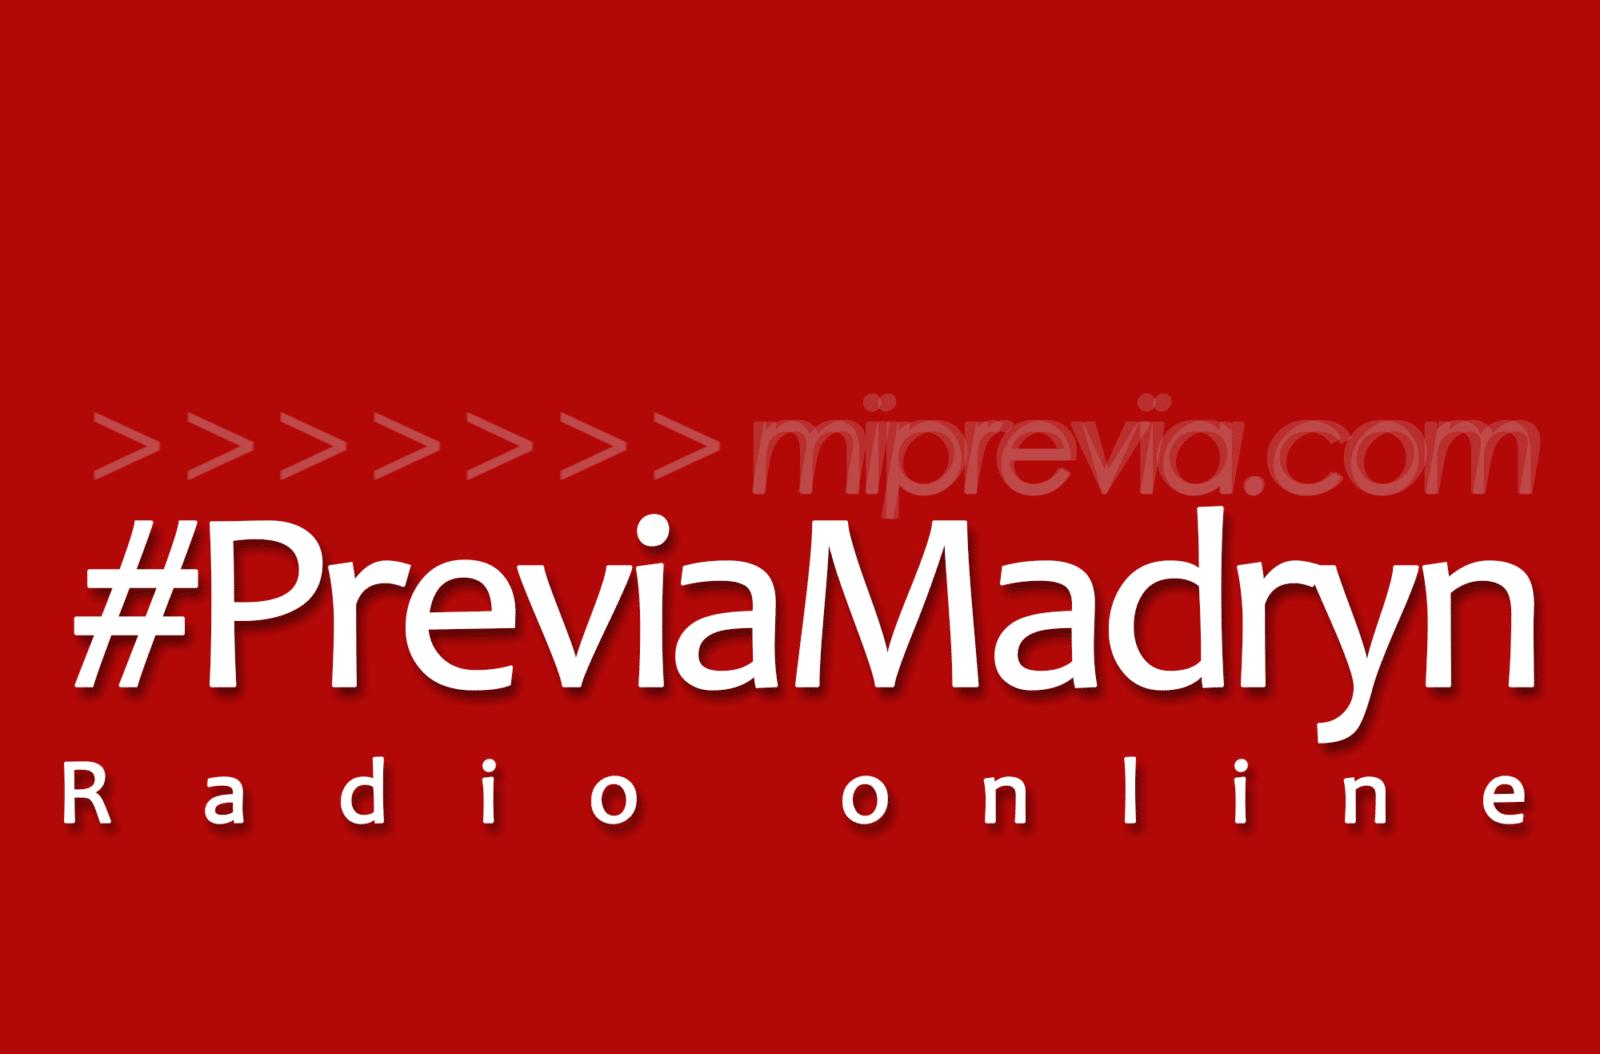 Previa Madryn Radio